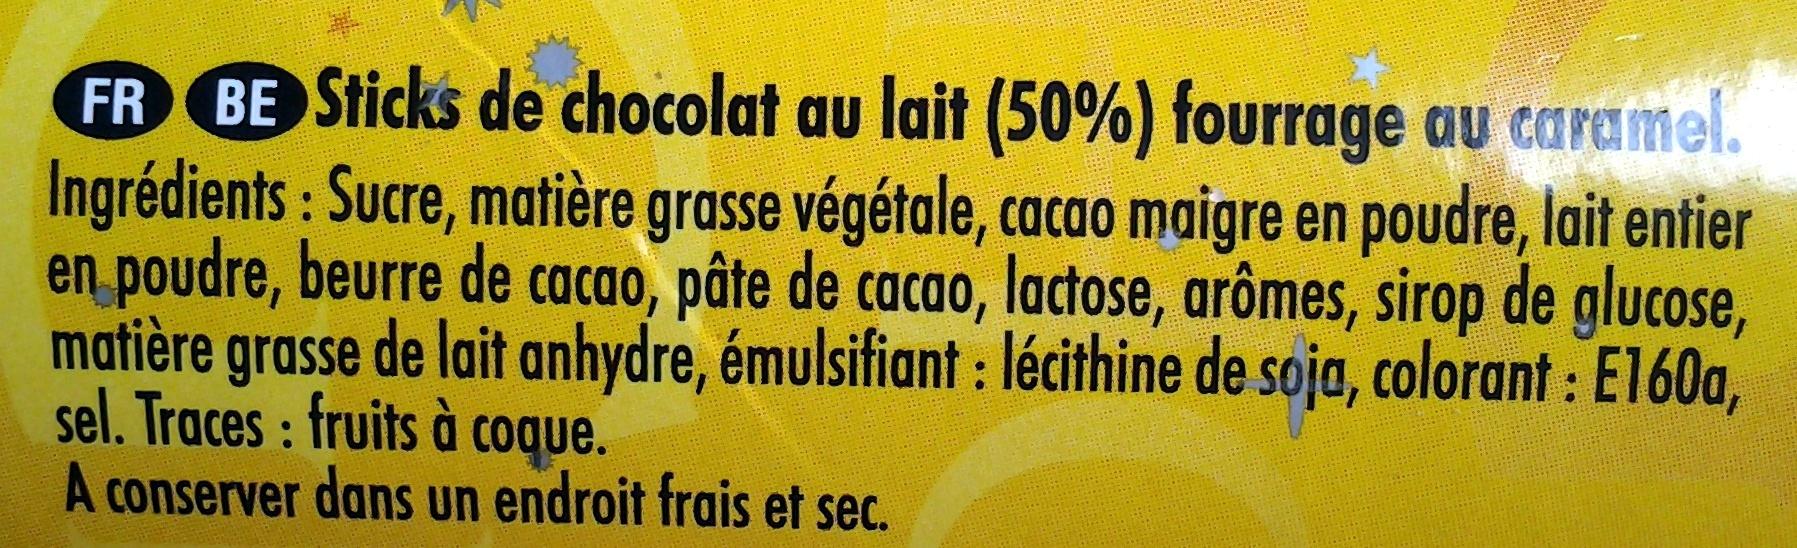 Fins Plaisirs Caramel - Ingredients - fr